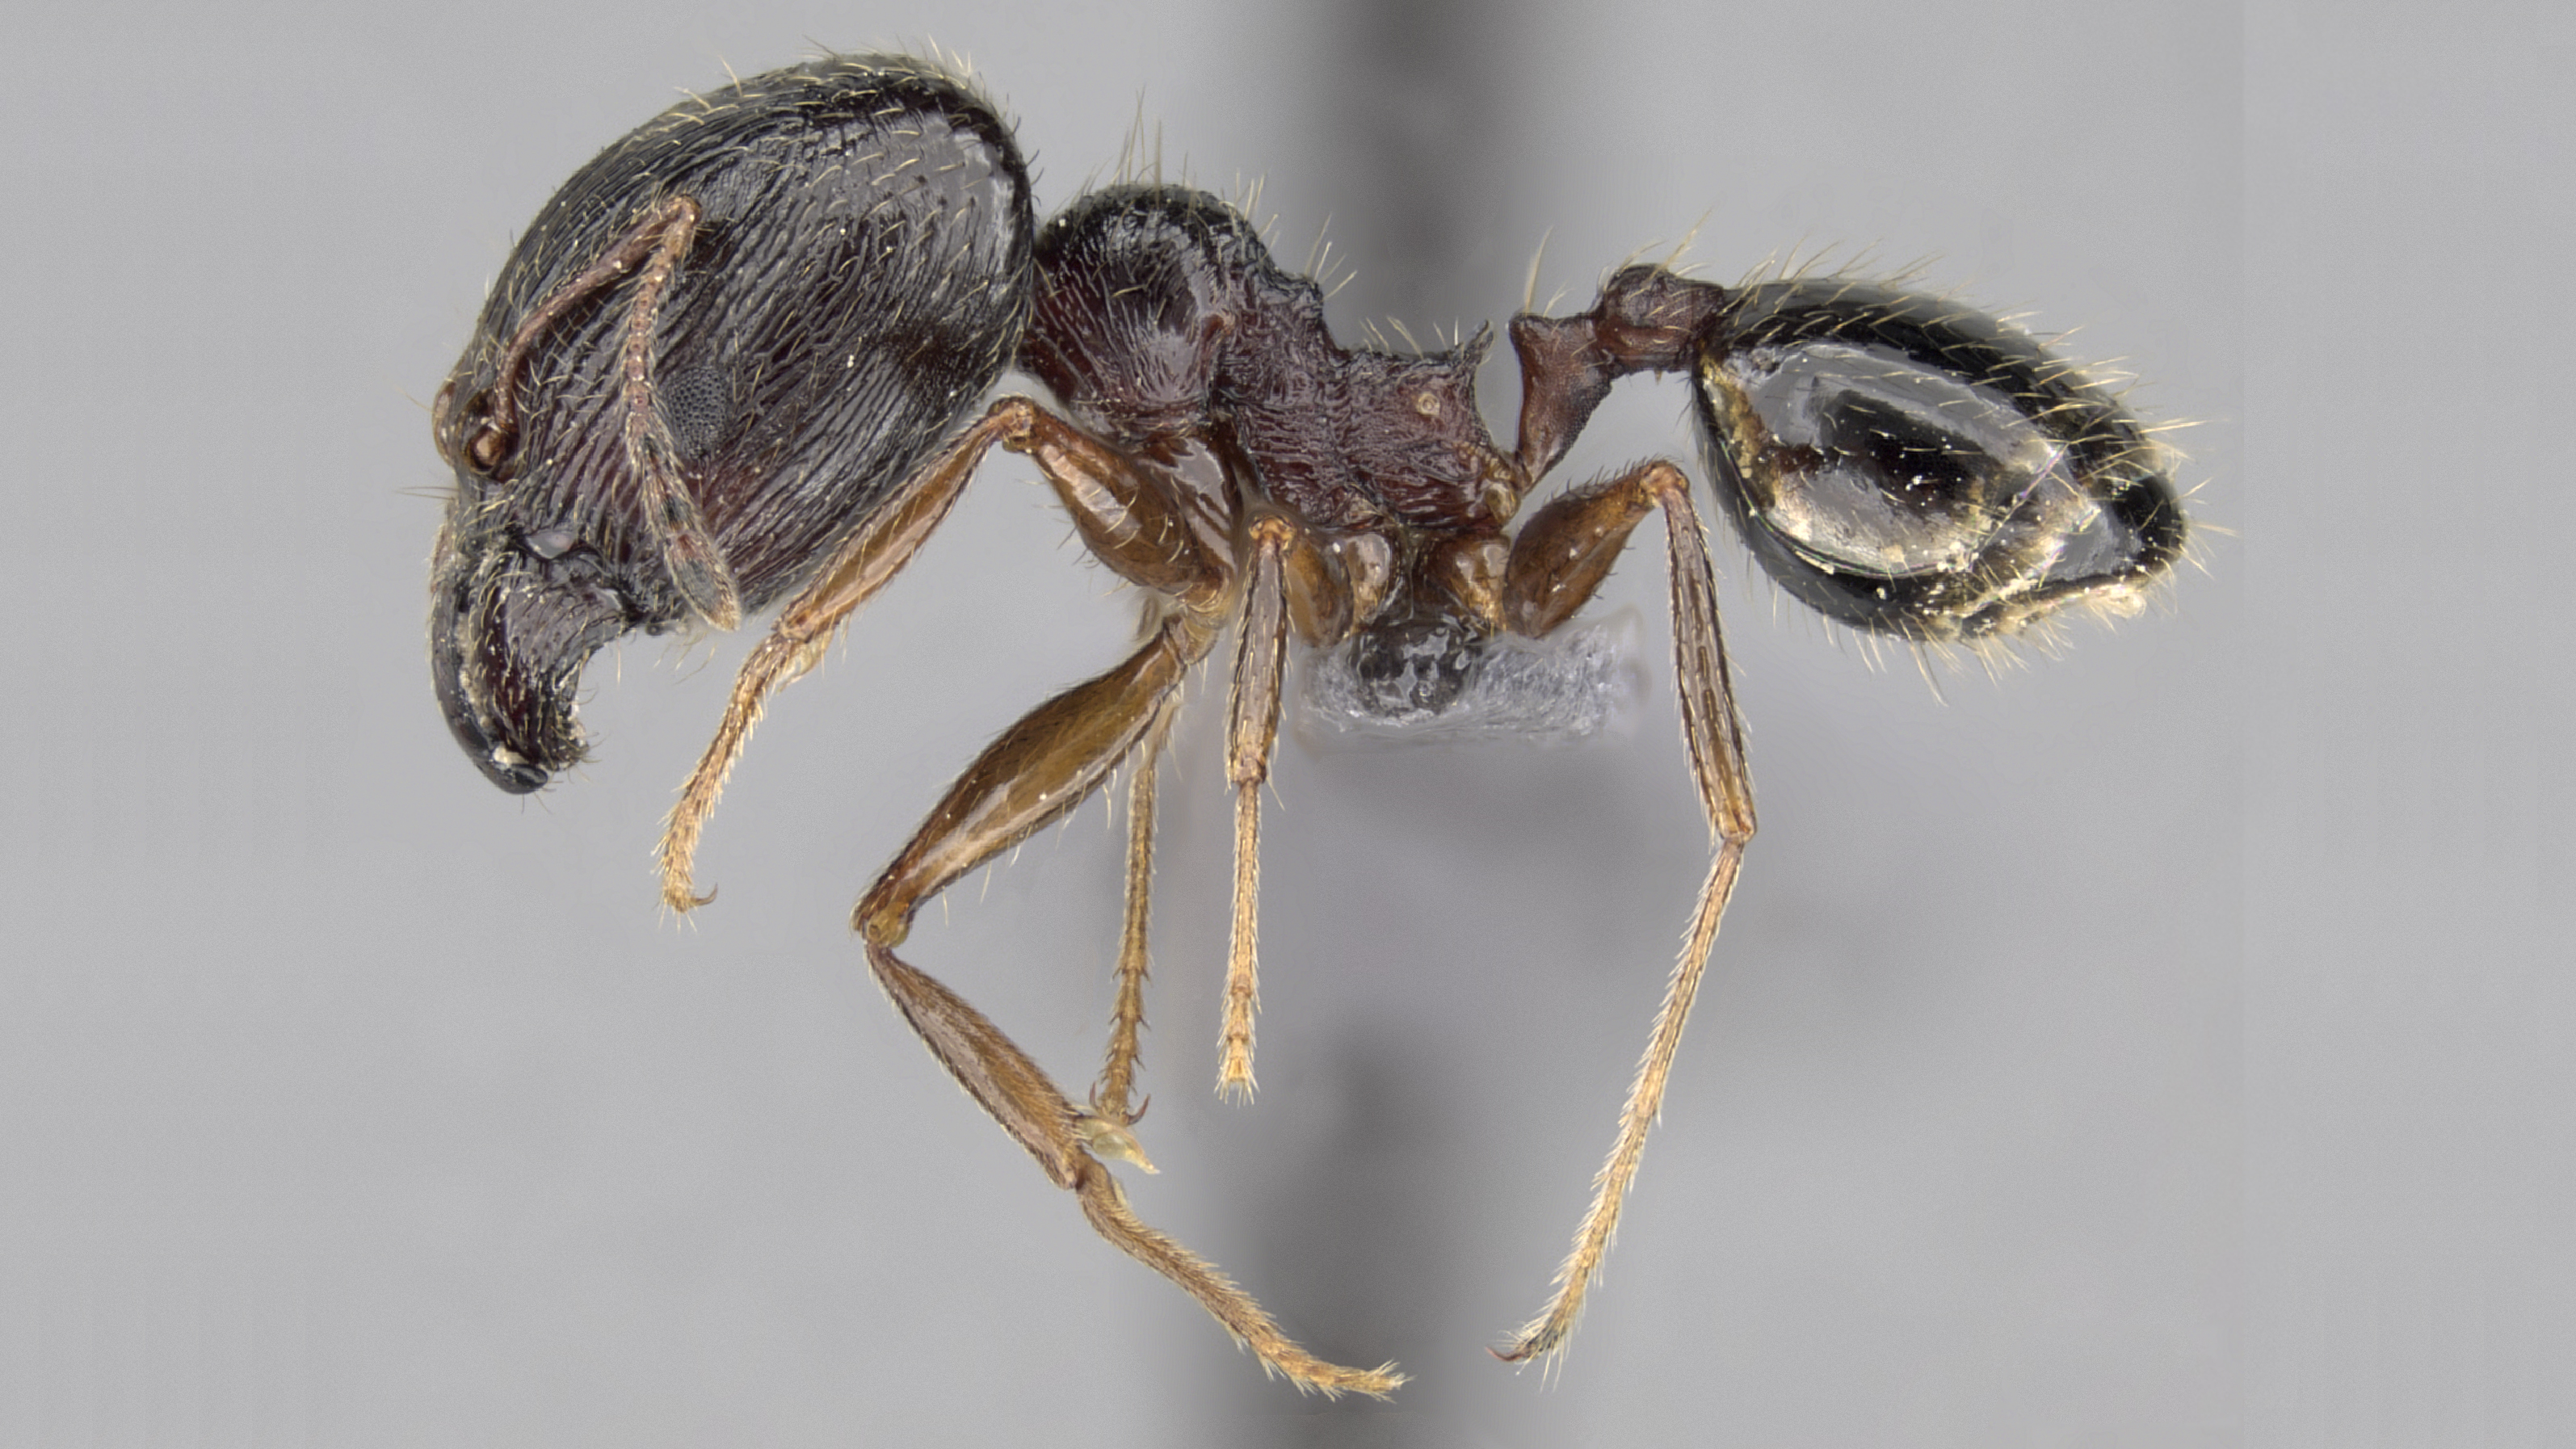 _destructive hymenoptera